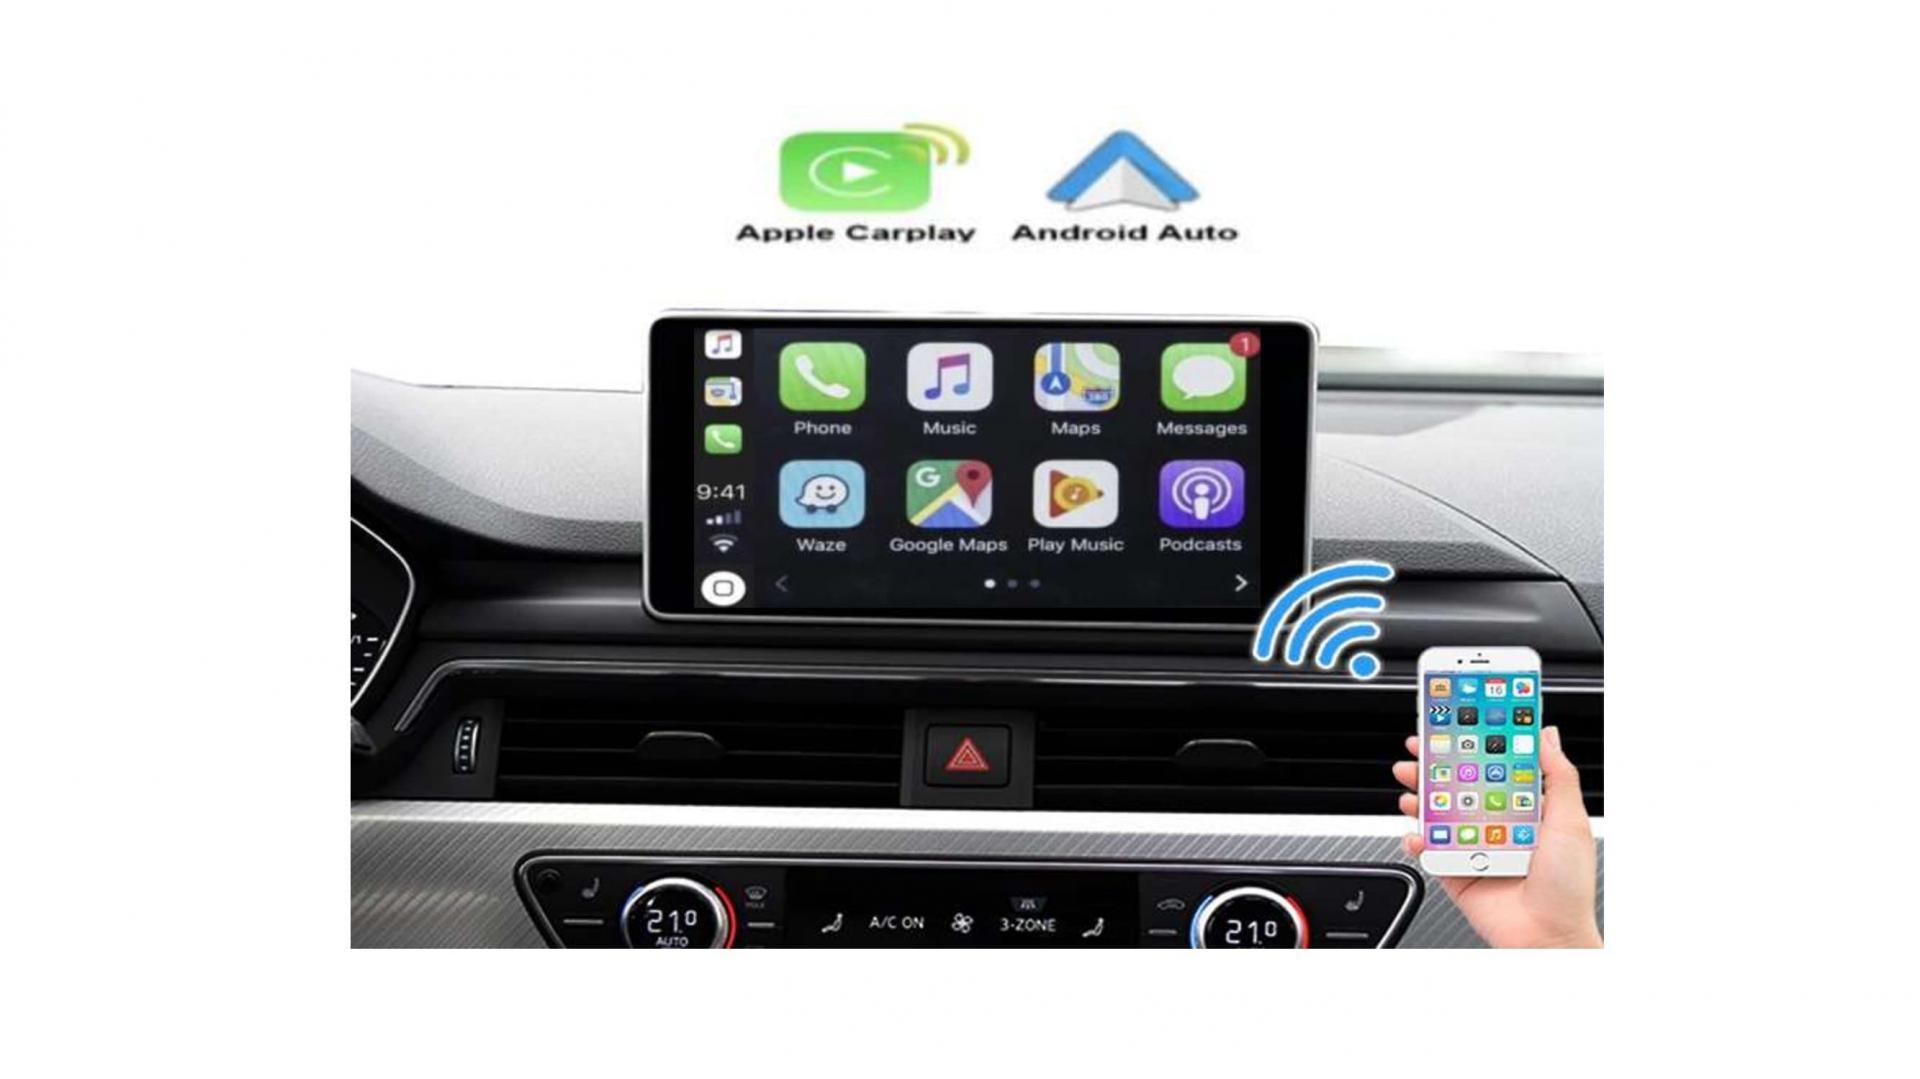 Bmw f20 21 7 g11carplay android auto gps autoradio i3 x3 m3 m5 x1 f48 x2 f39 2010 2011 2012 2013 2014 2015 2016 2017 2018 2019 308 408 audi a3 ds4 e84 camera de recul commande au s